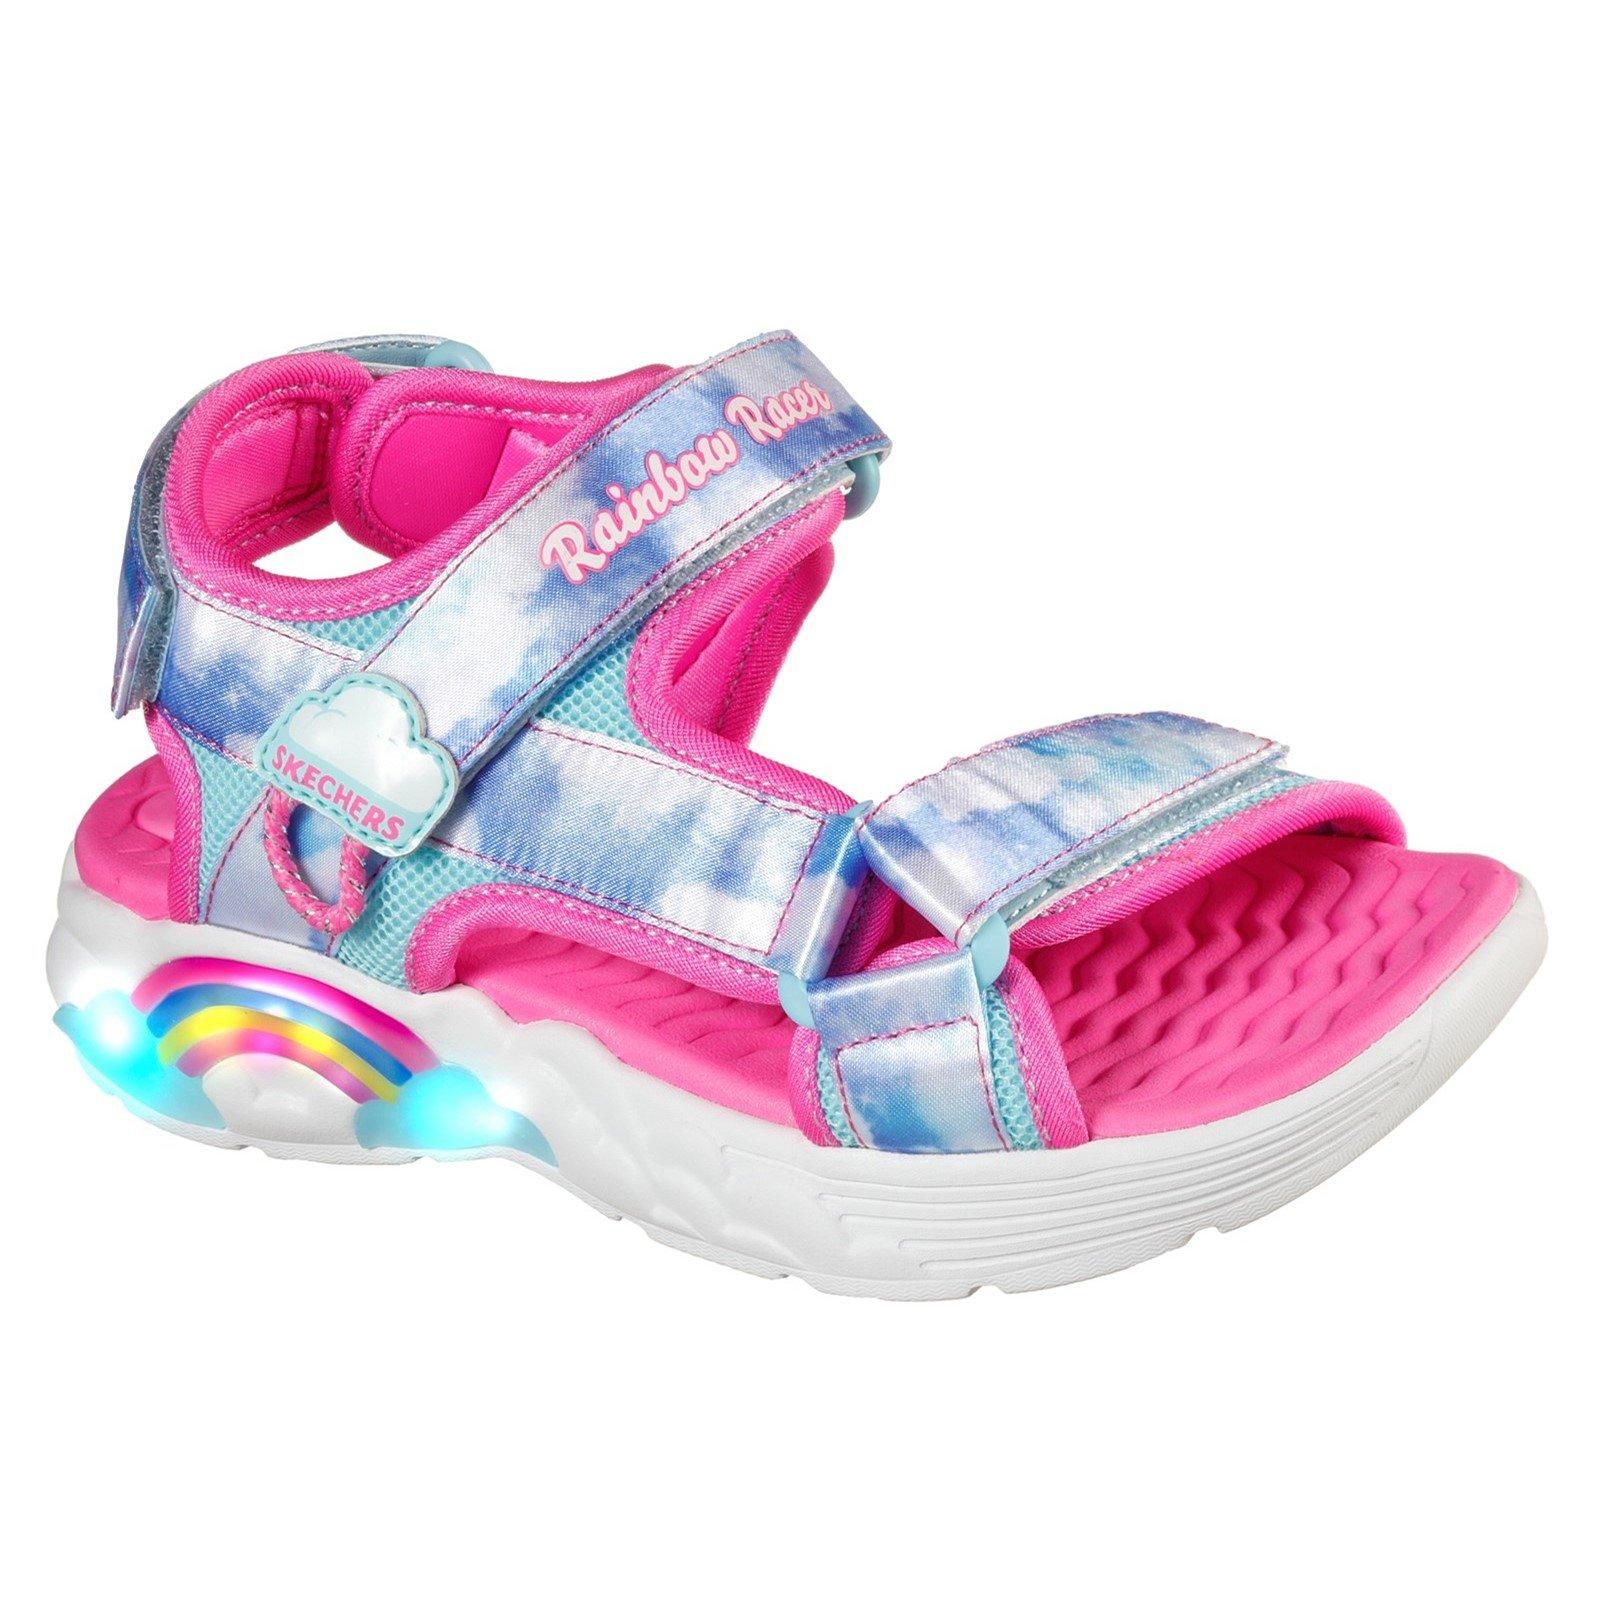 Skechers Unisex Rainbow Racer Summer Sky Beach Sandals Multicolor 32096 - Pink/Light Blue Pu 7